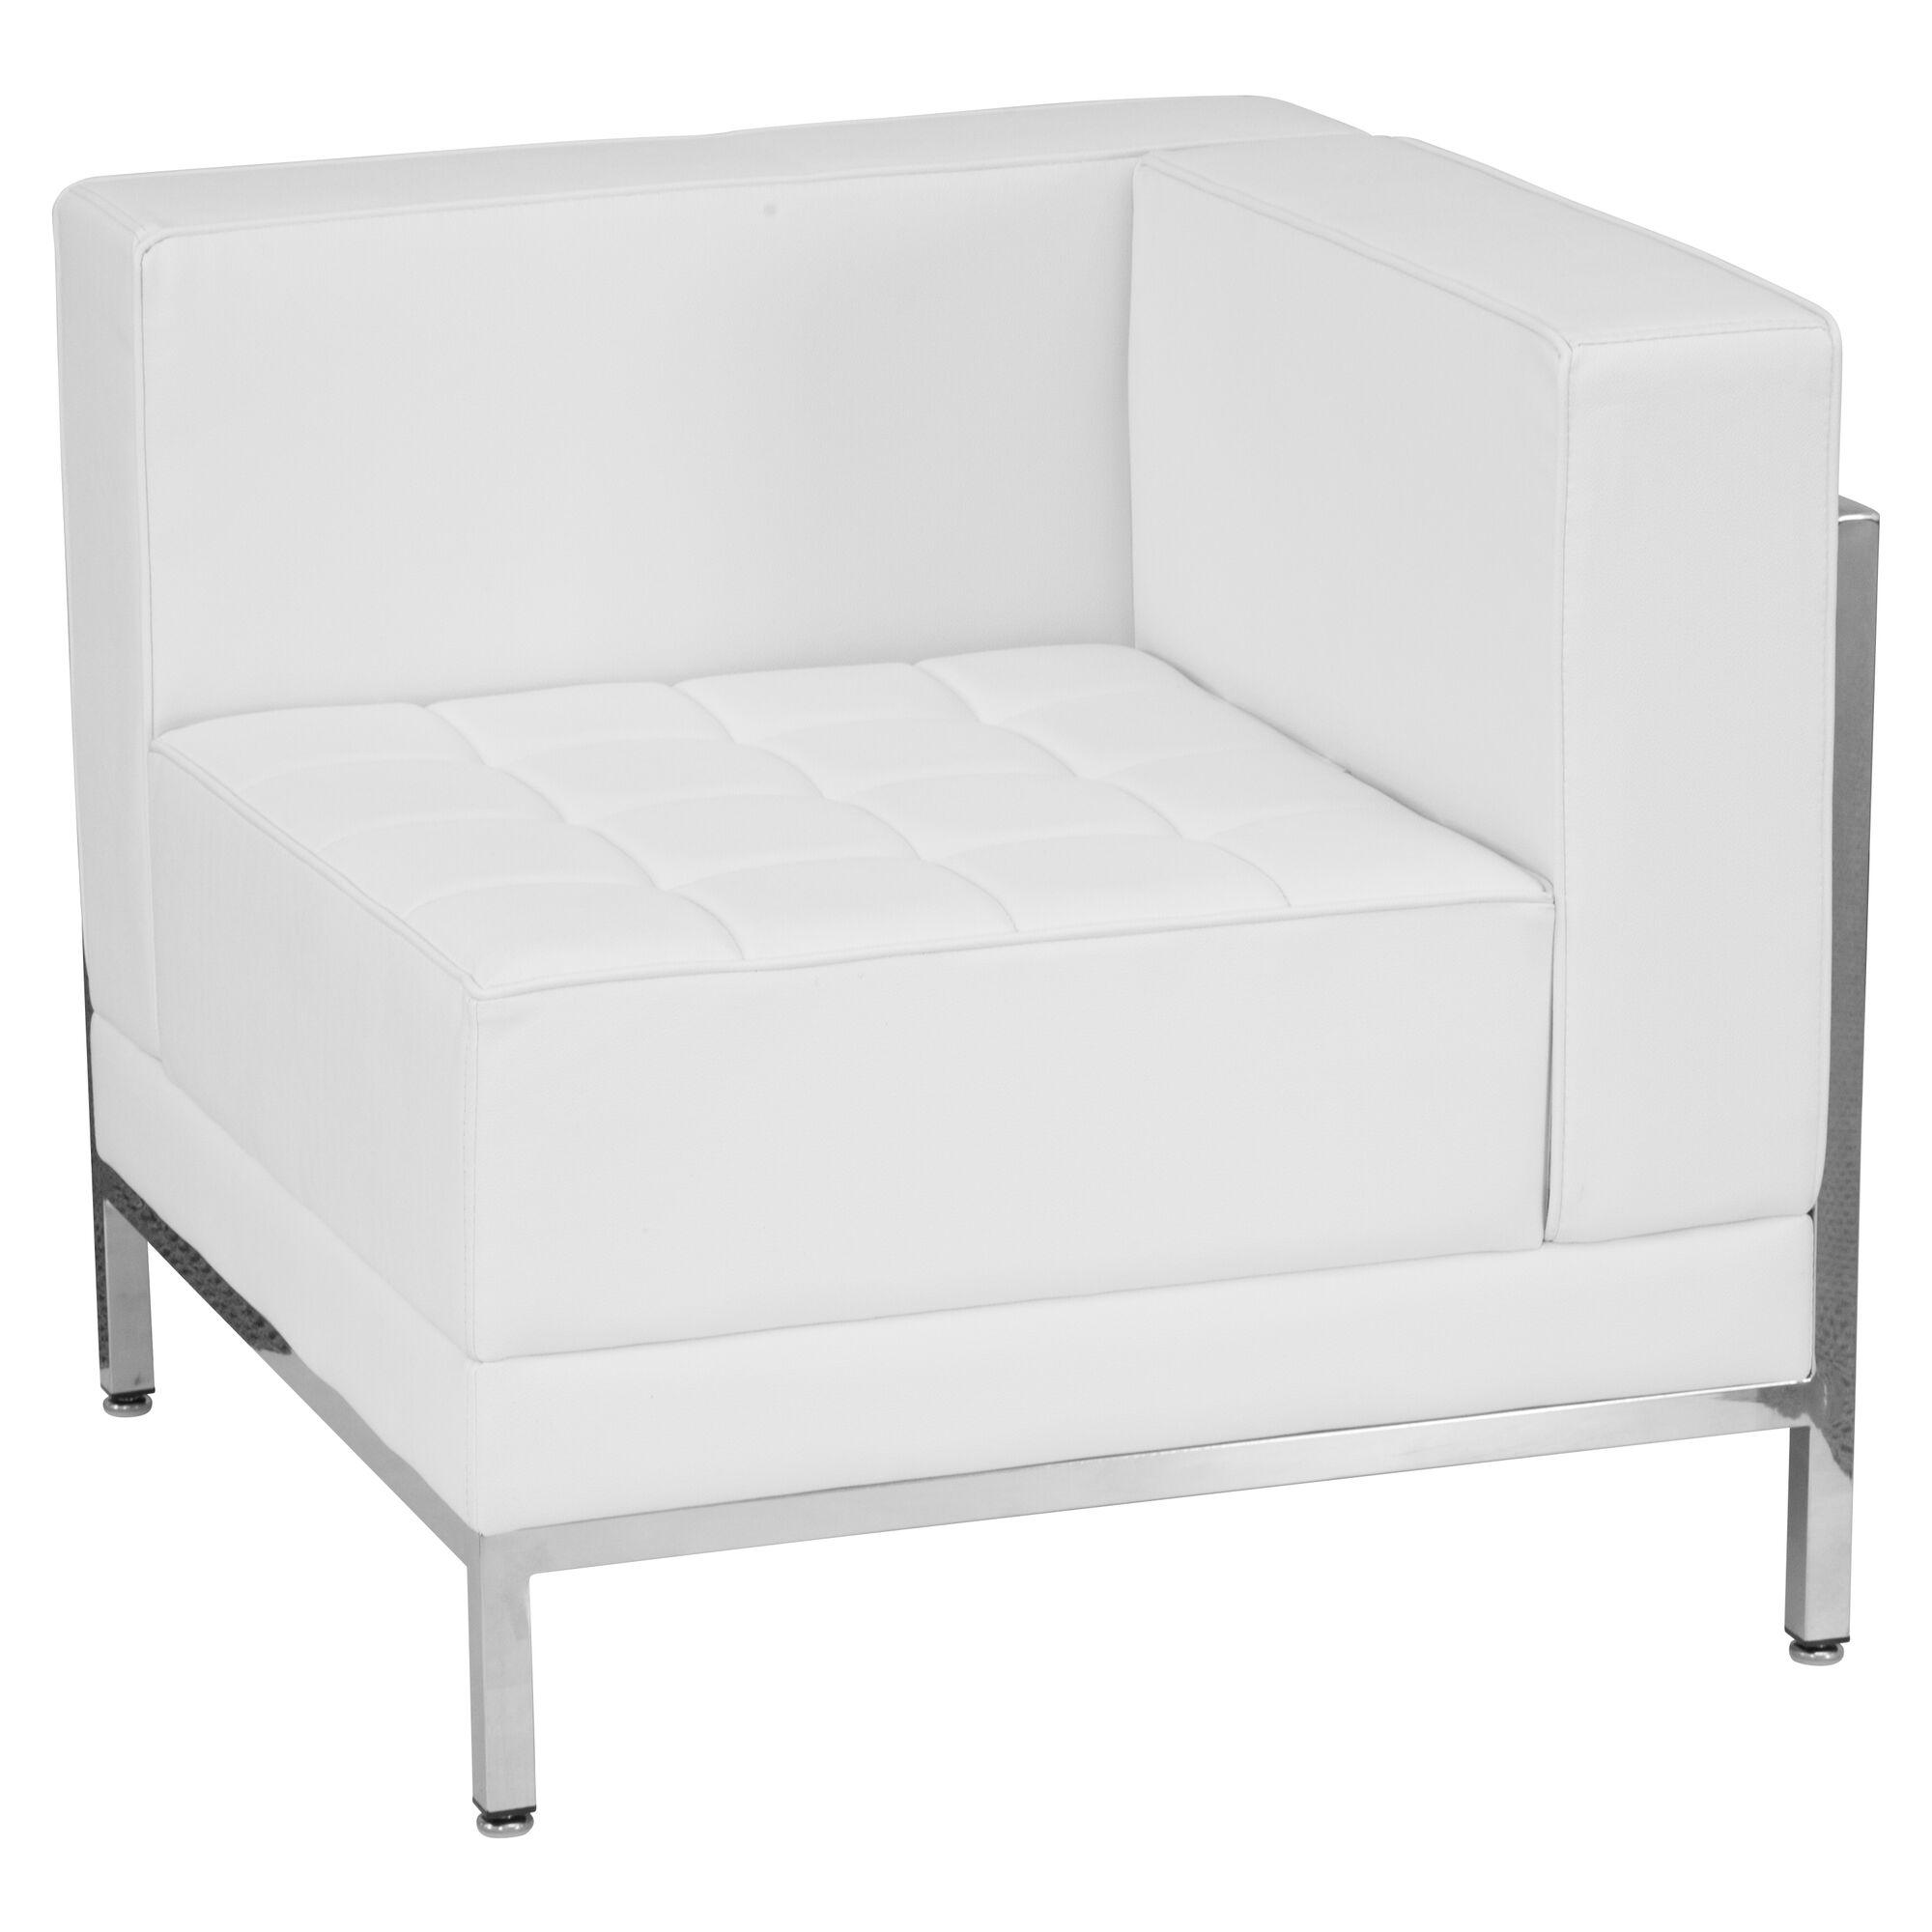 White Corner Leather Chair Zb Imag Right Corner Wh Gg